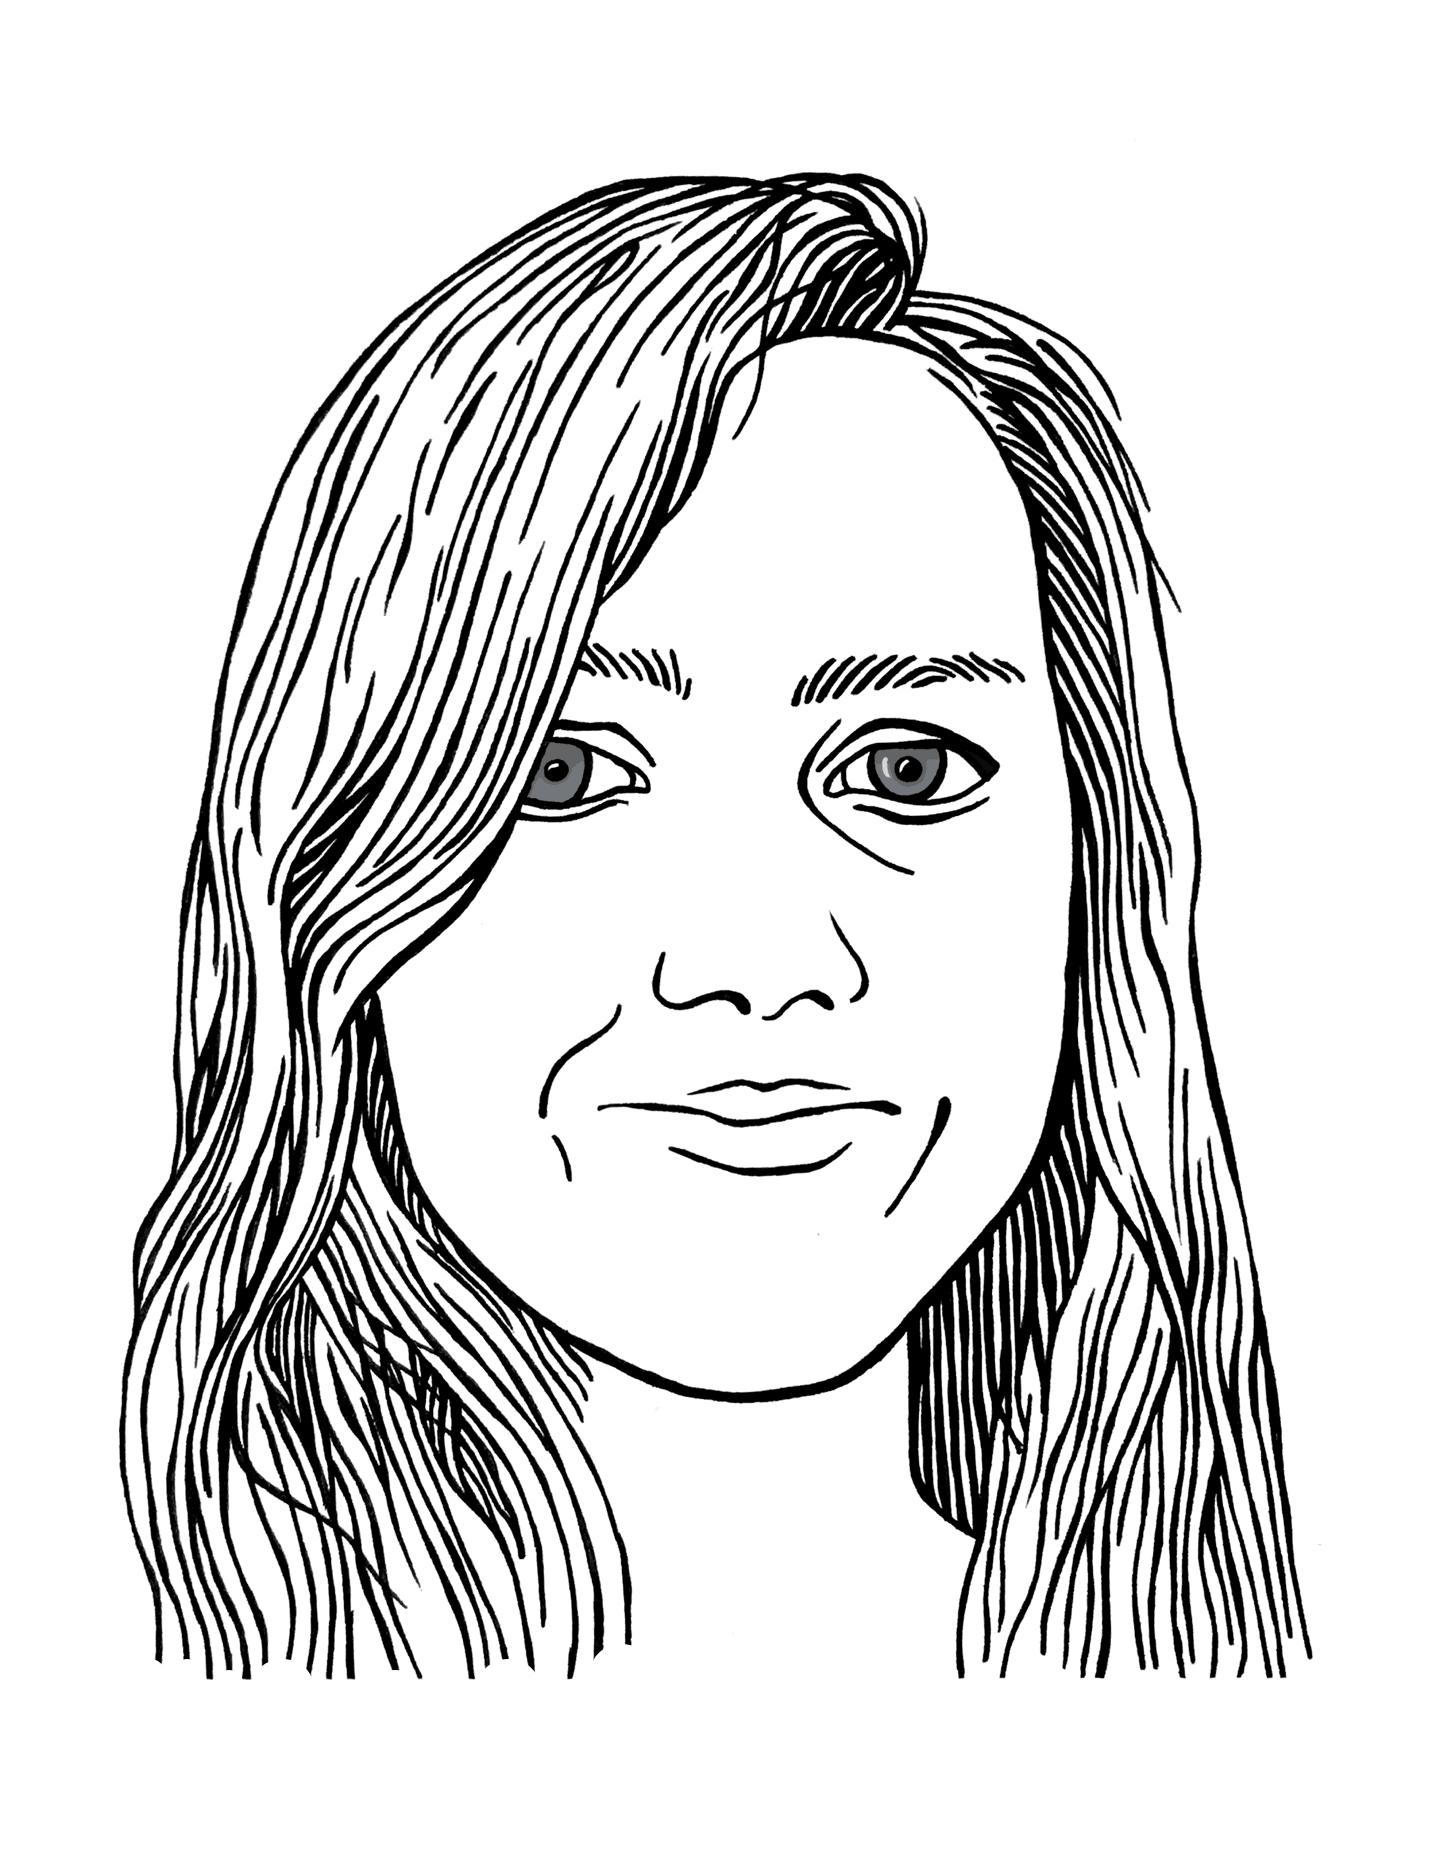 Nadia Weijers